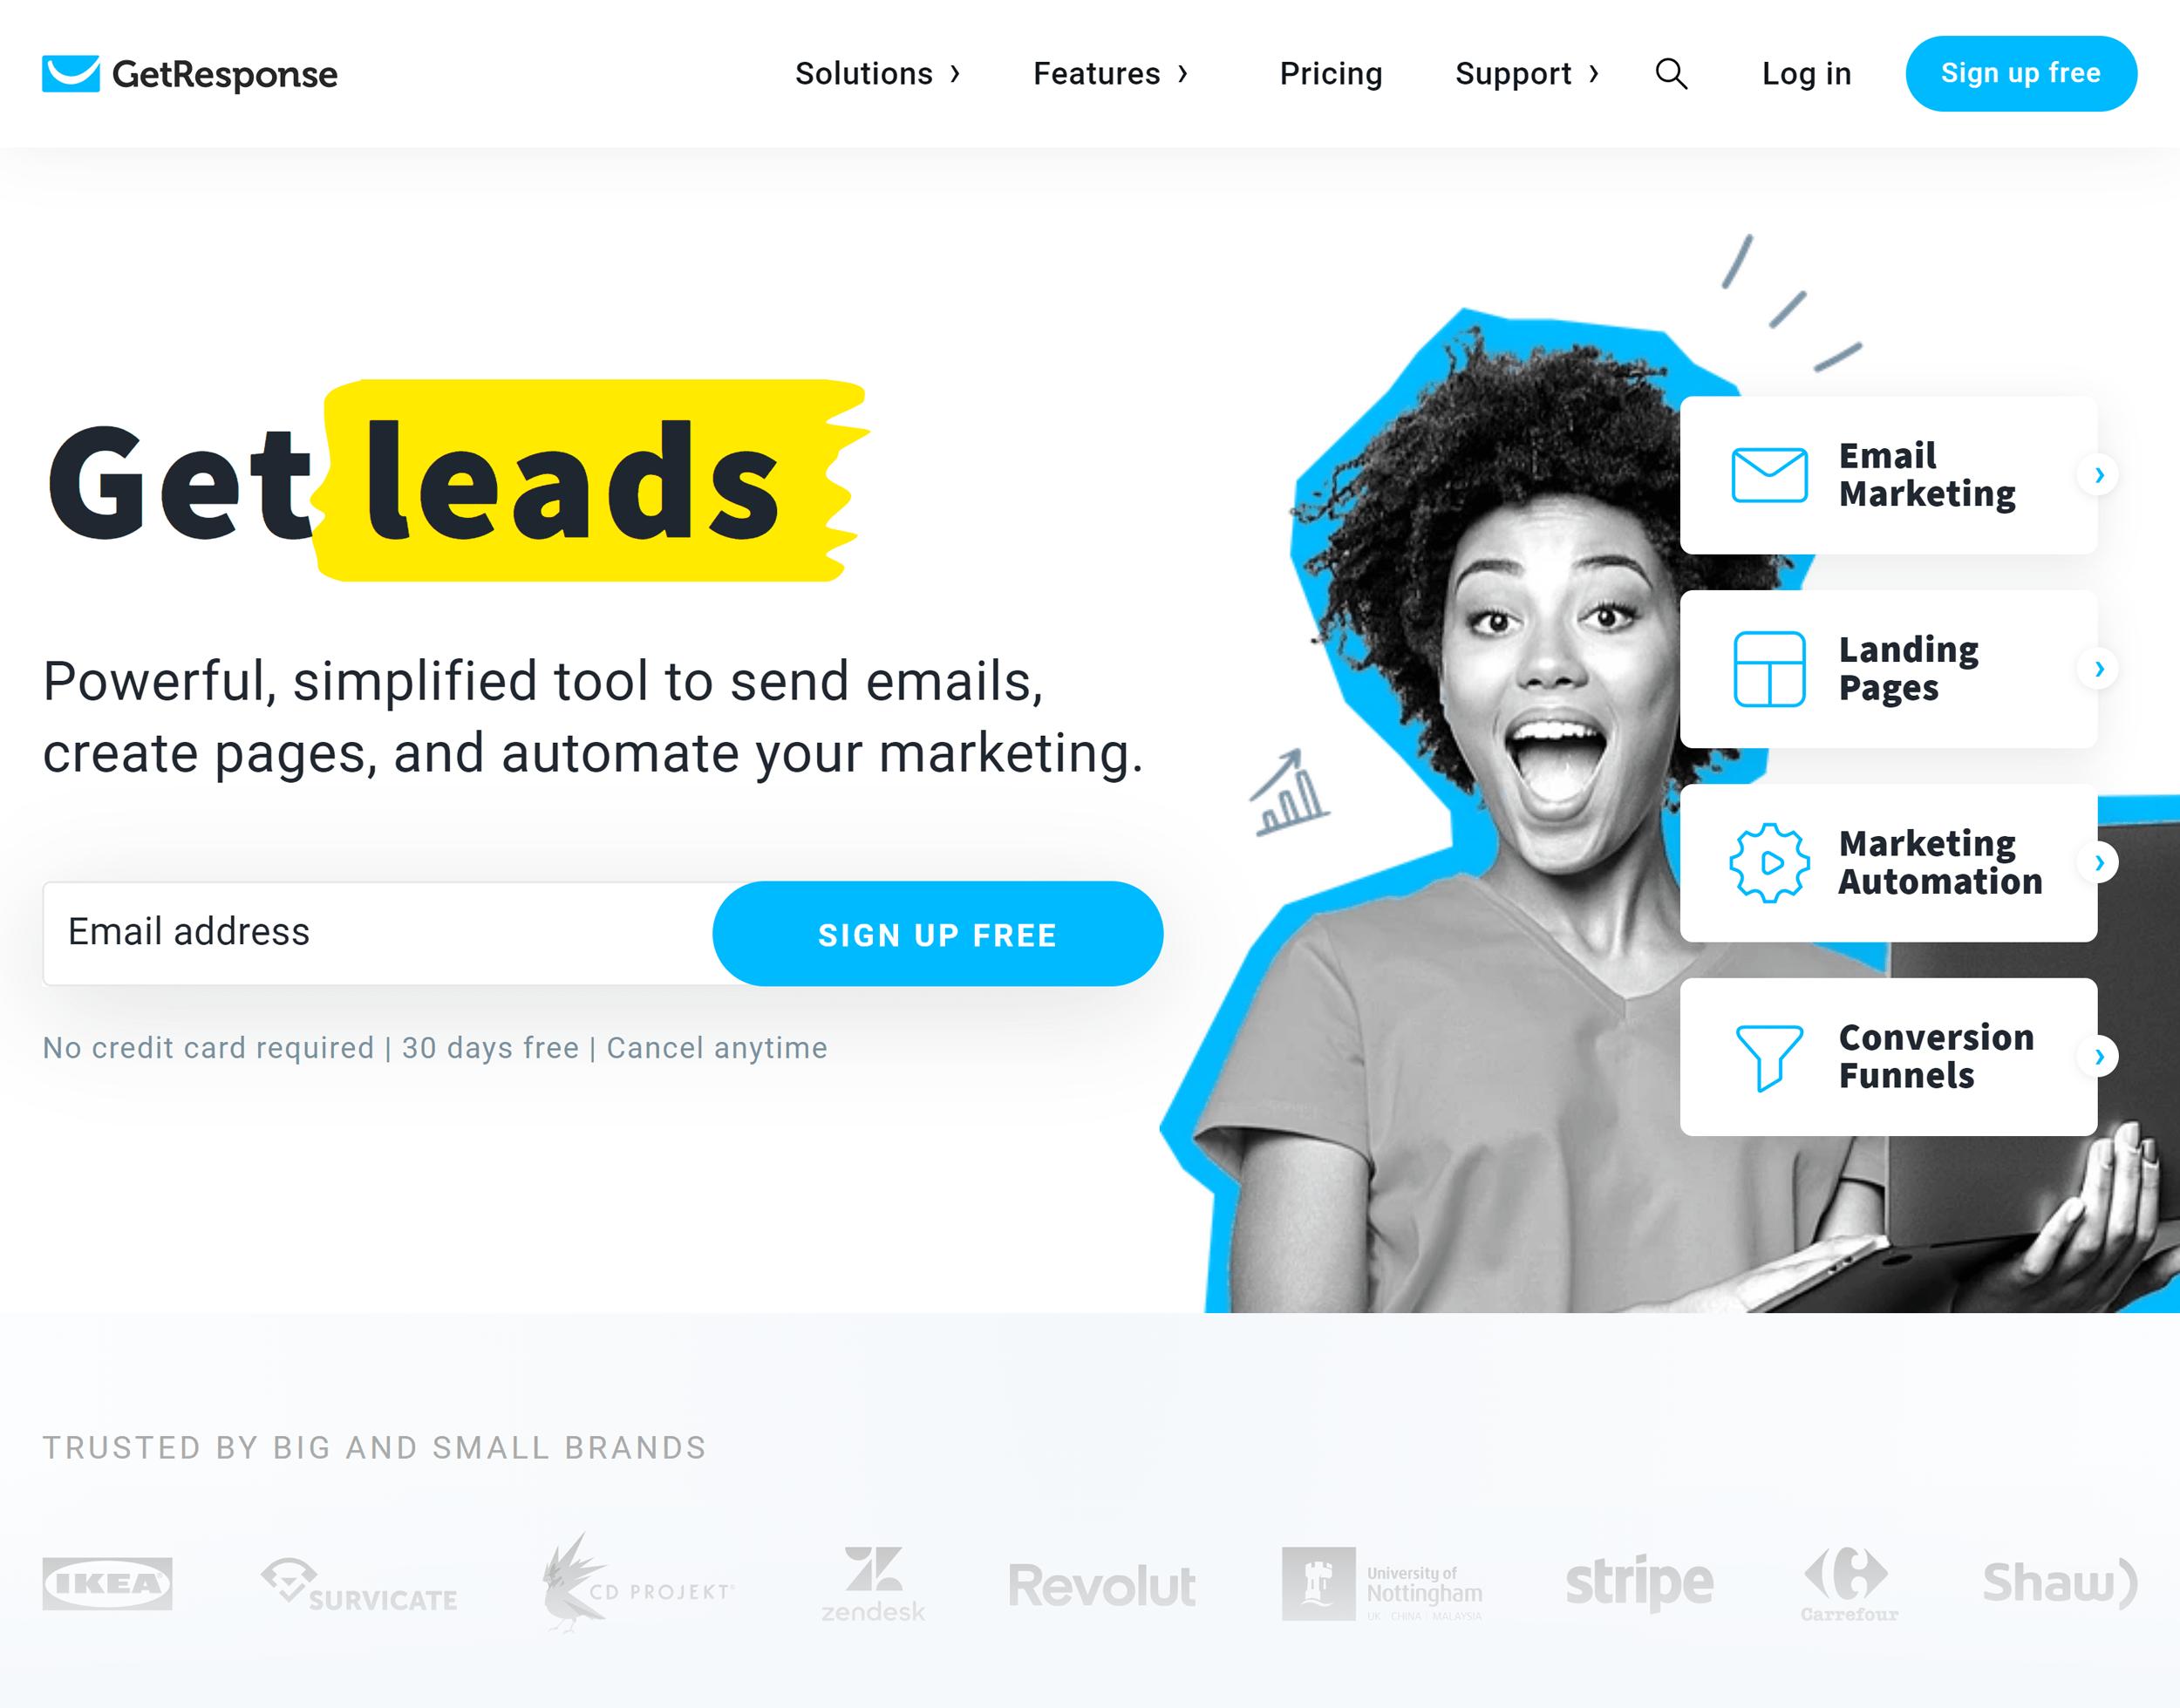 GetResponse – Homepage